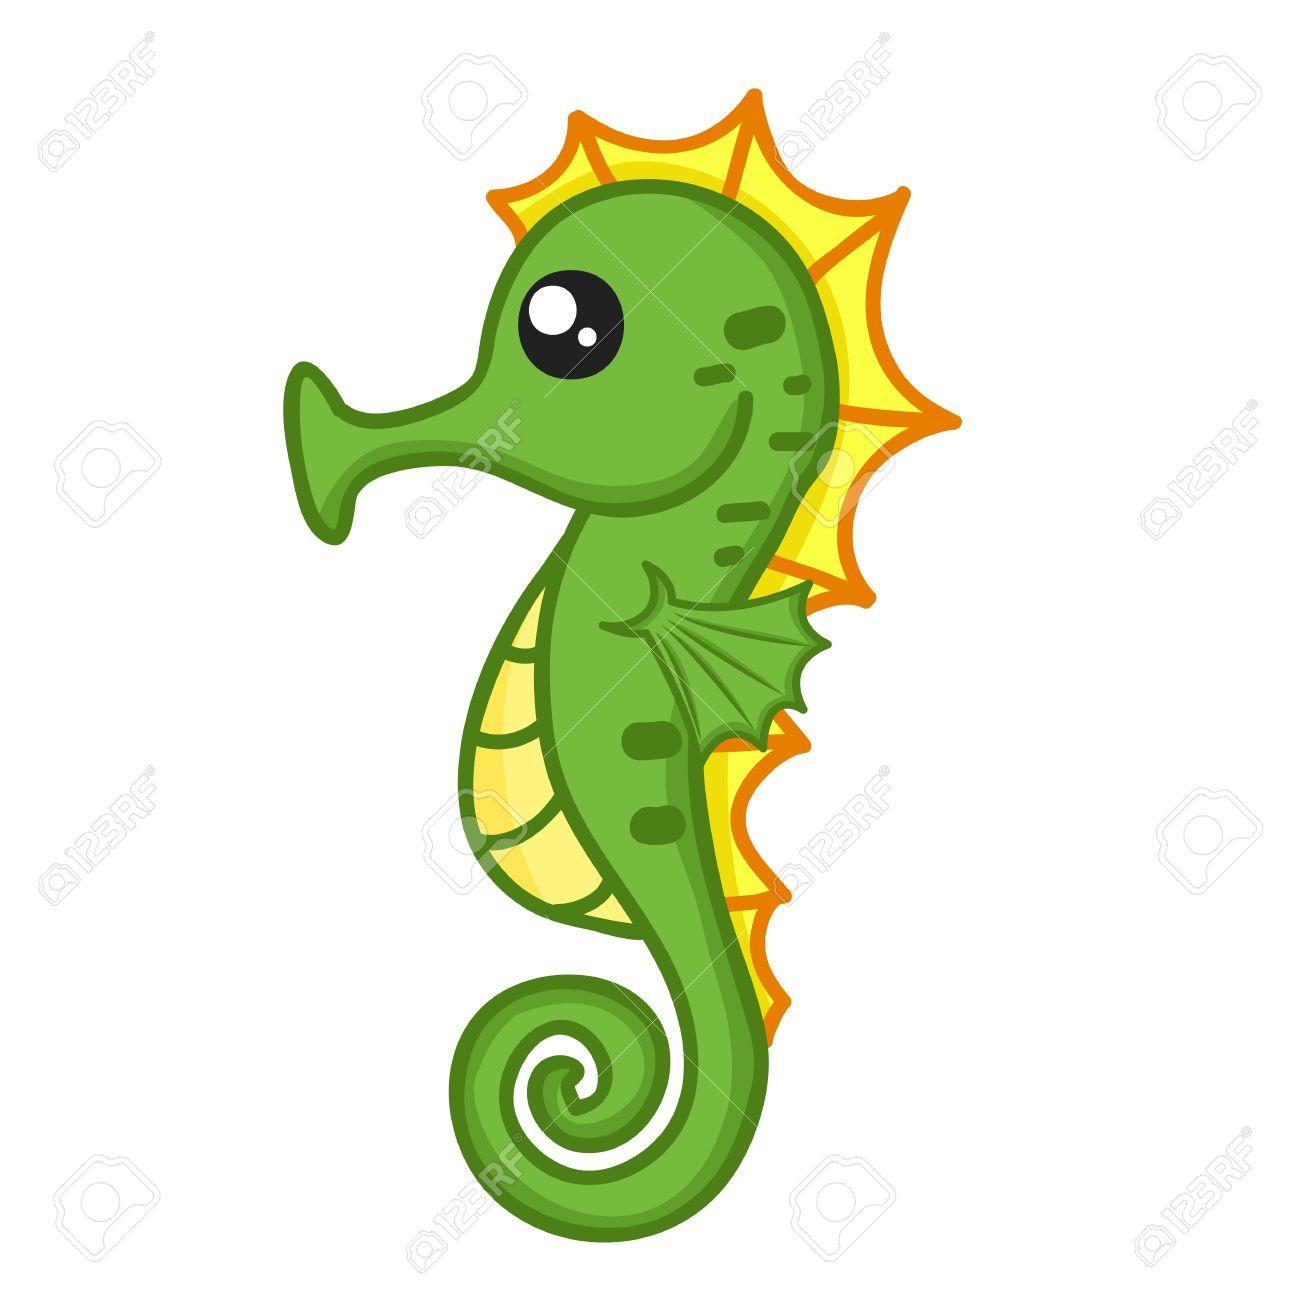 Seahorse clipart disney #2